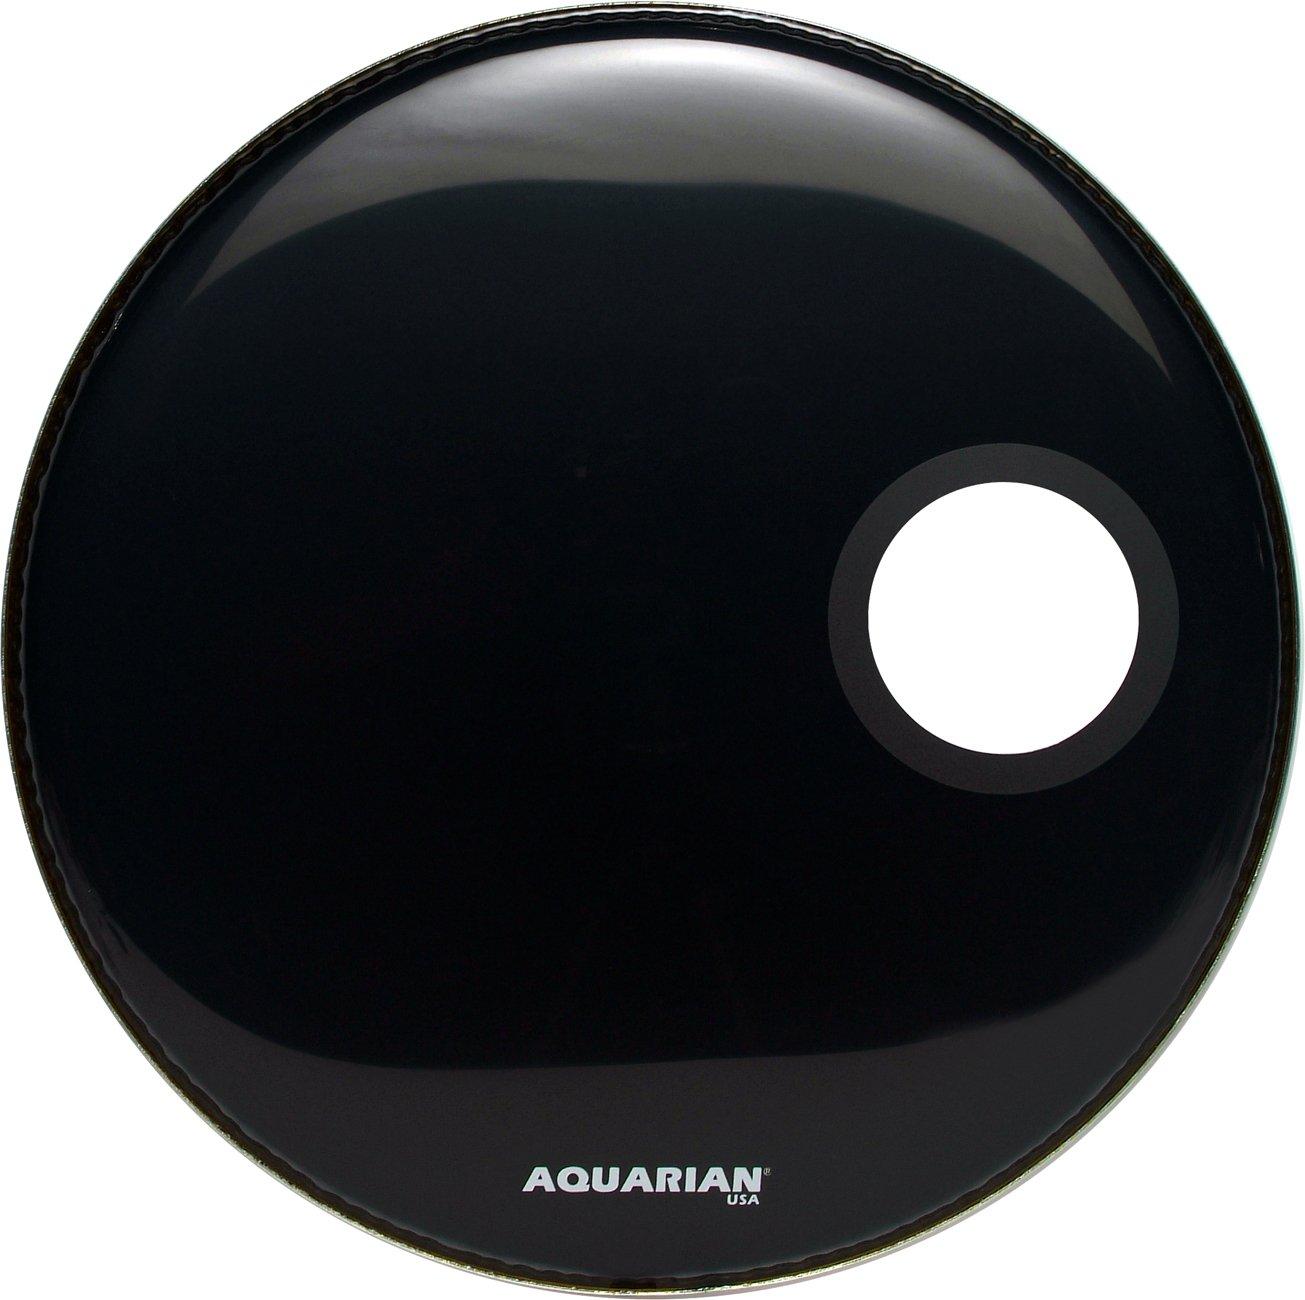 Aquarian Drumheads SMPTCC26BK Offset Ported Bass 26-inch Bass Drum Head, gloss black